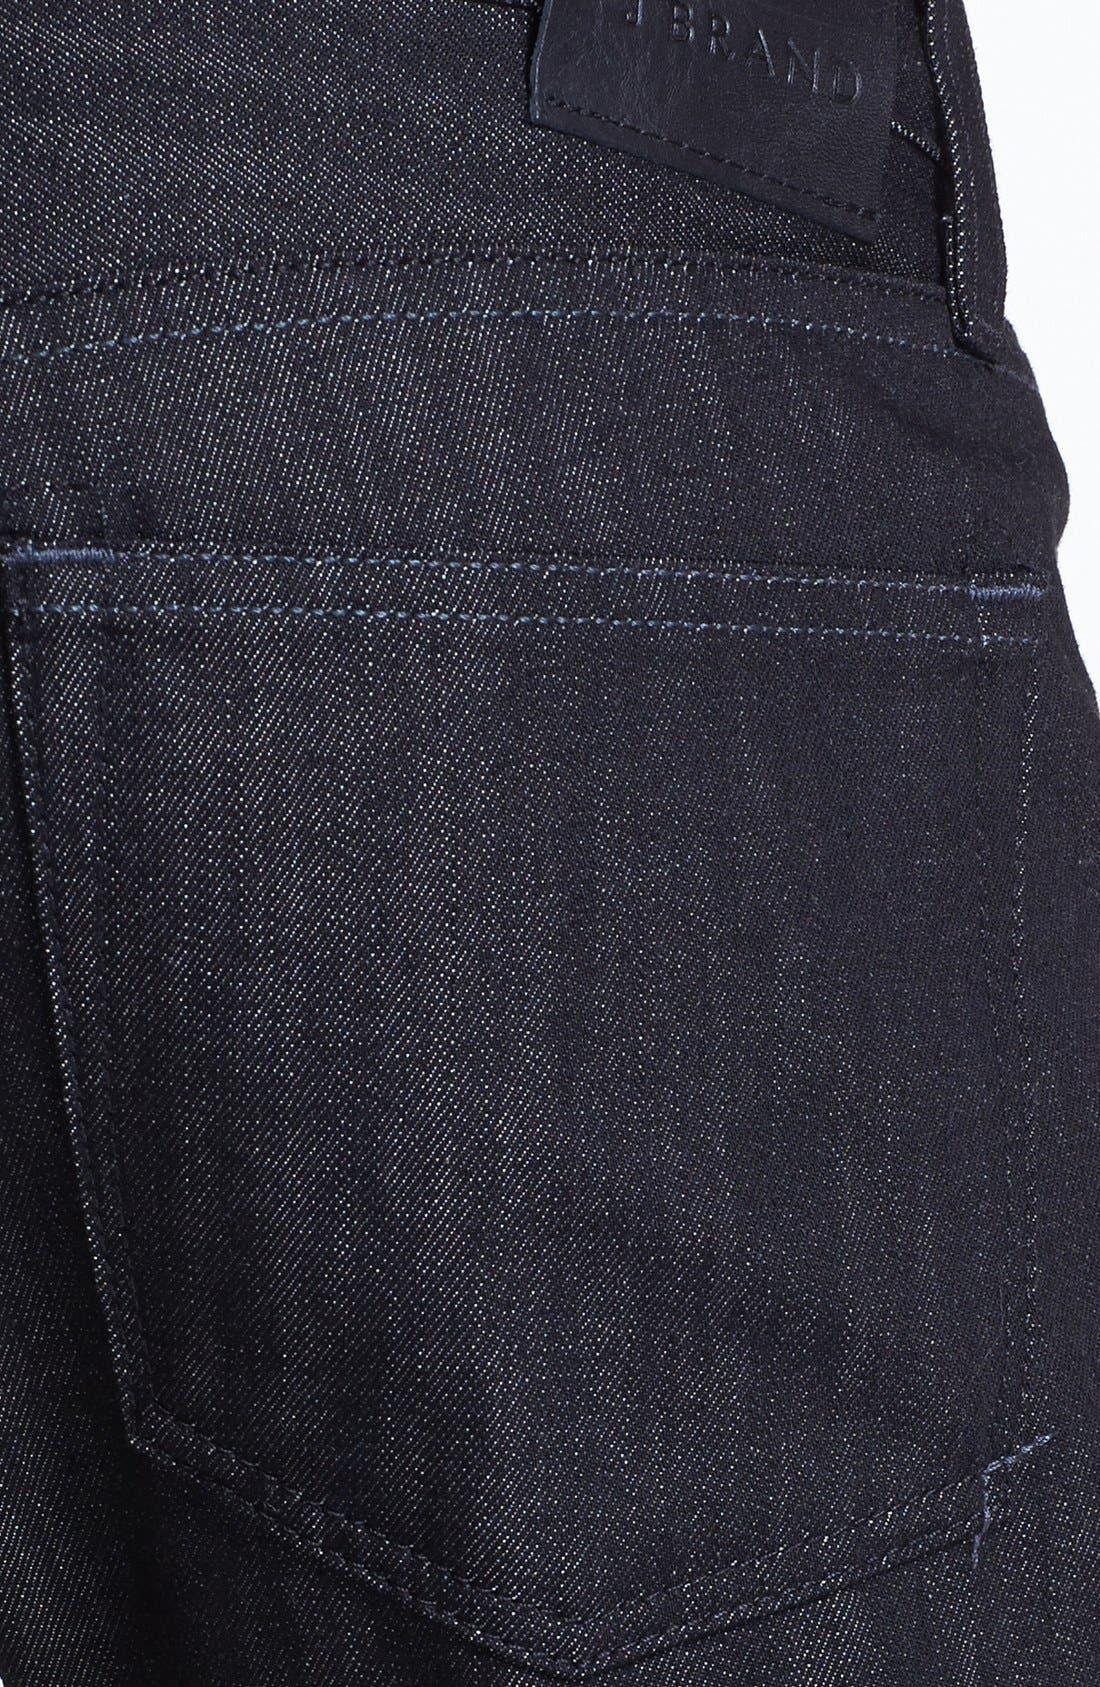 Alternate Image 4  - J Brand 'Tyler' Slim Fit Jeans (Black Raw)